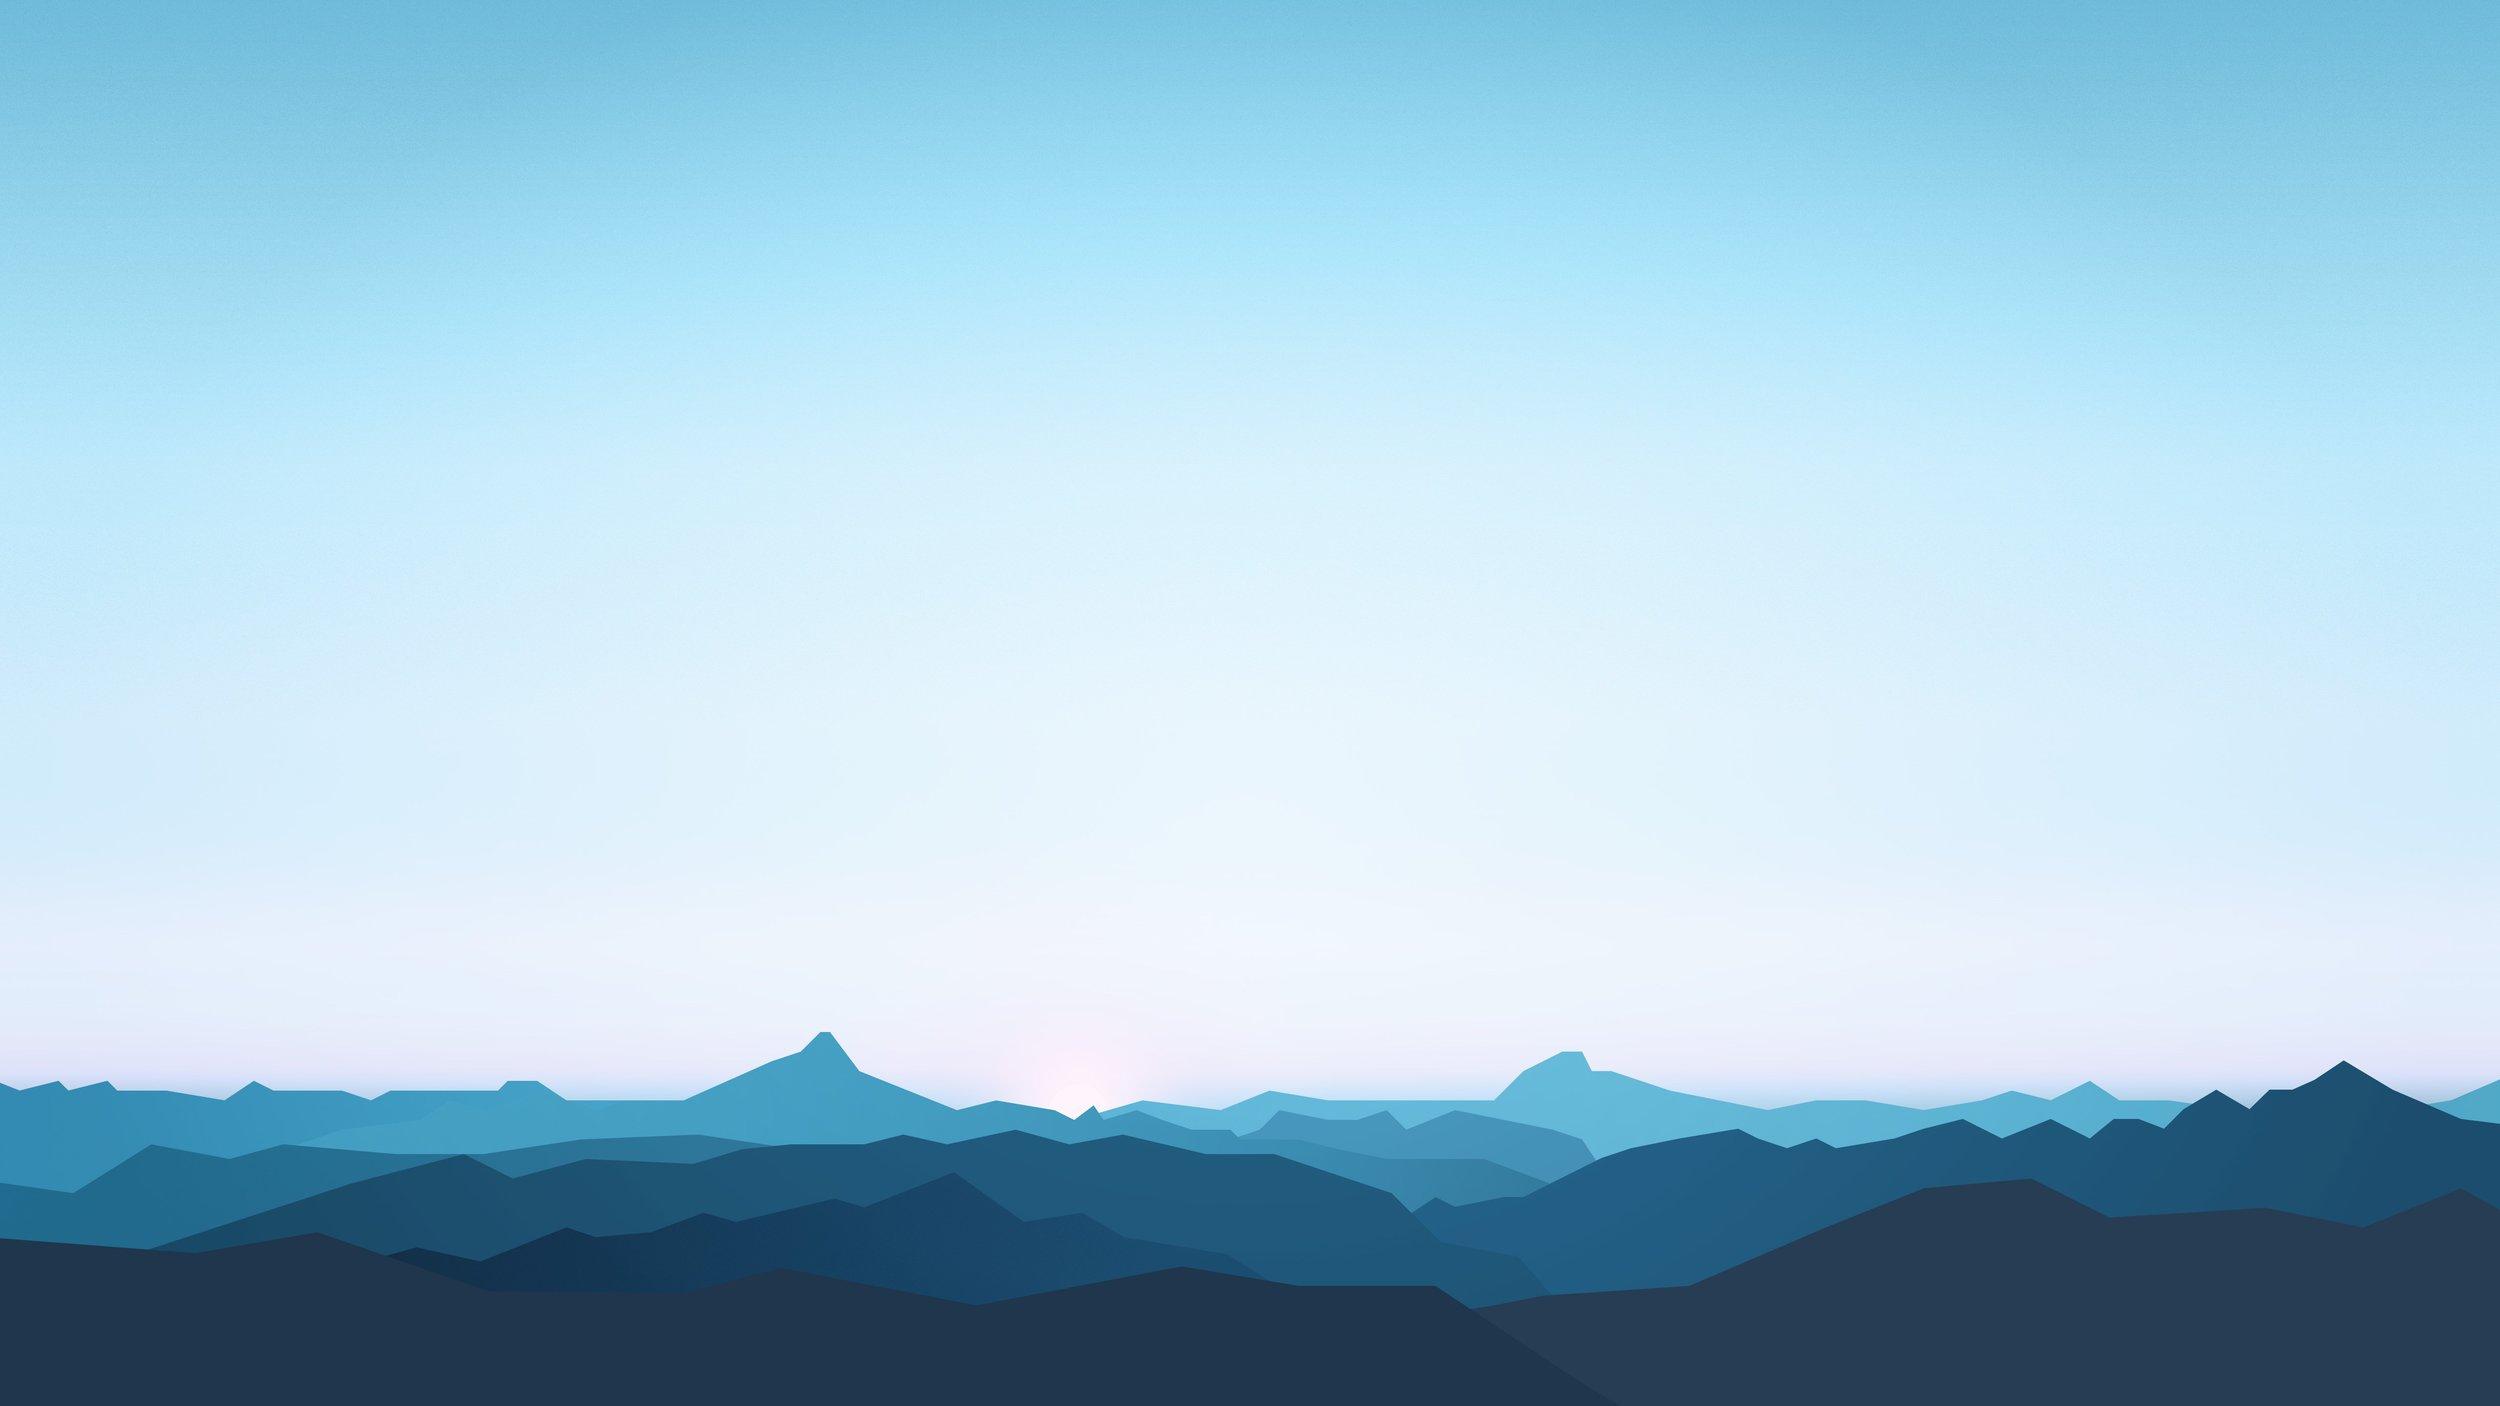 Minimal-Mountain-Wallpaper-Sillhoutte-Simple-DarGadgetZ-1.jpg